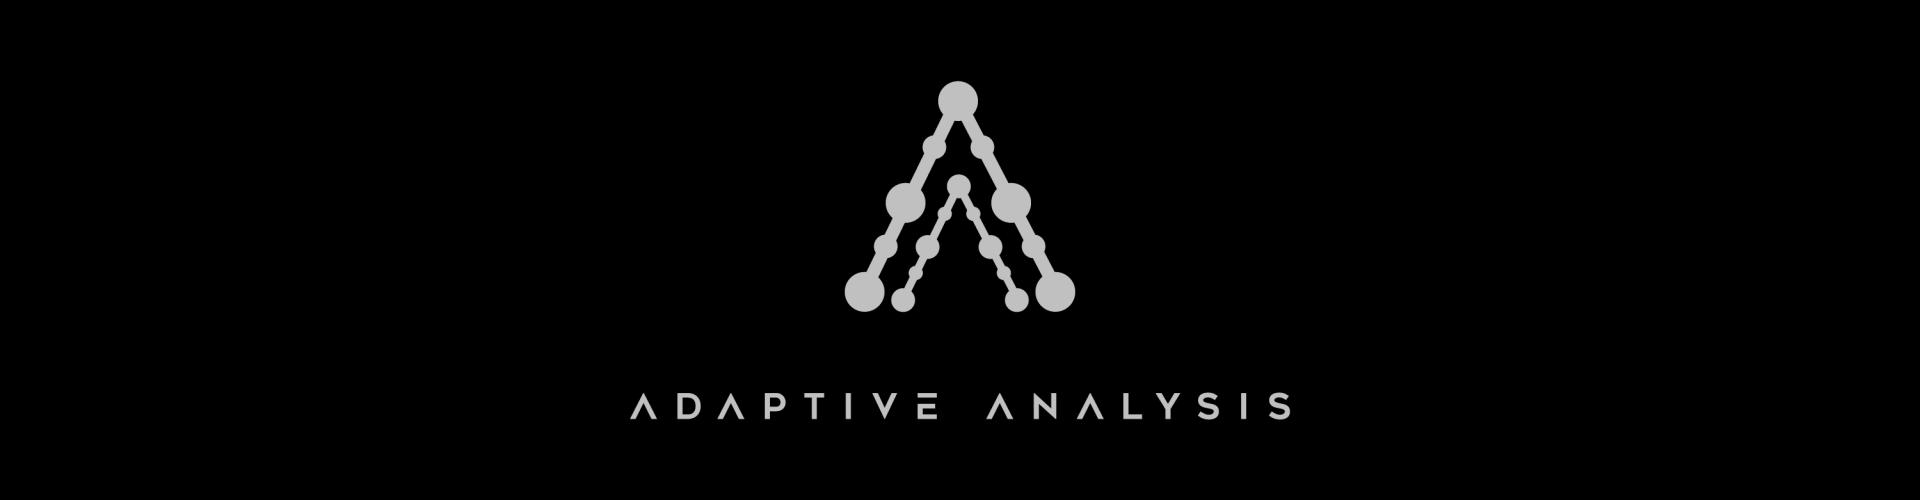 Adaptive Analysis